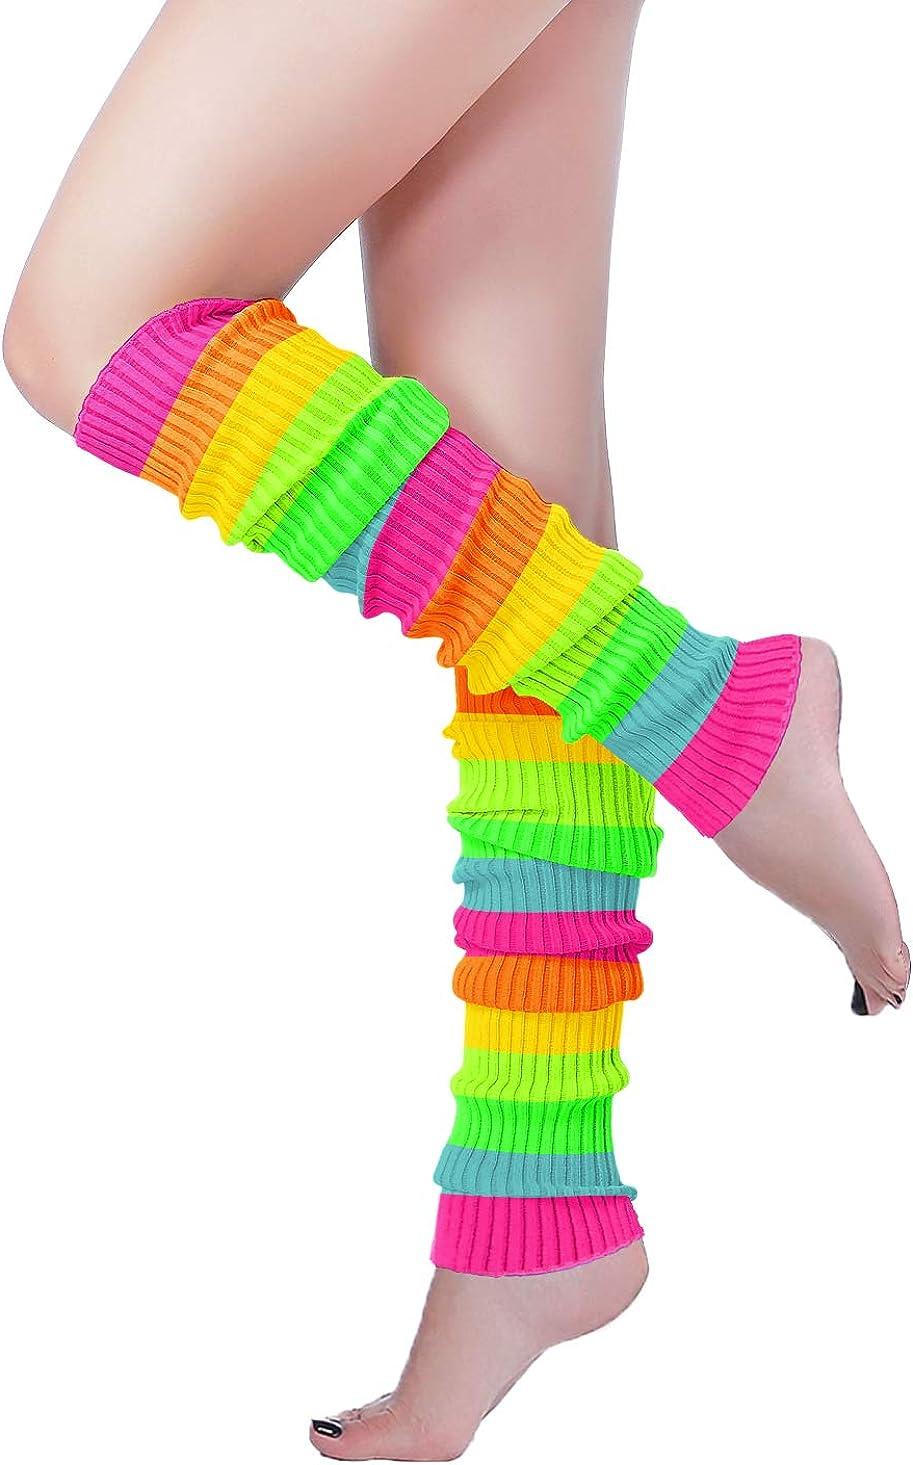 Long Leg Warmer, V28 Women's Men 80s Party Ribbed Knit Dance Sports